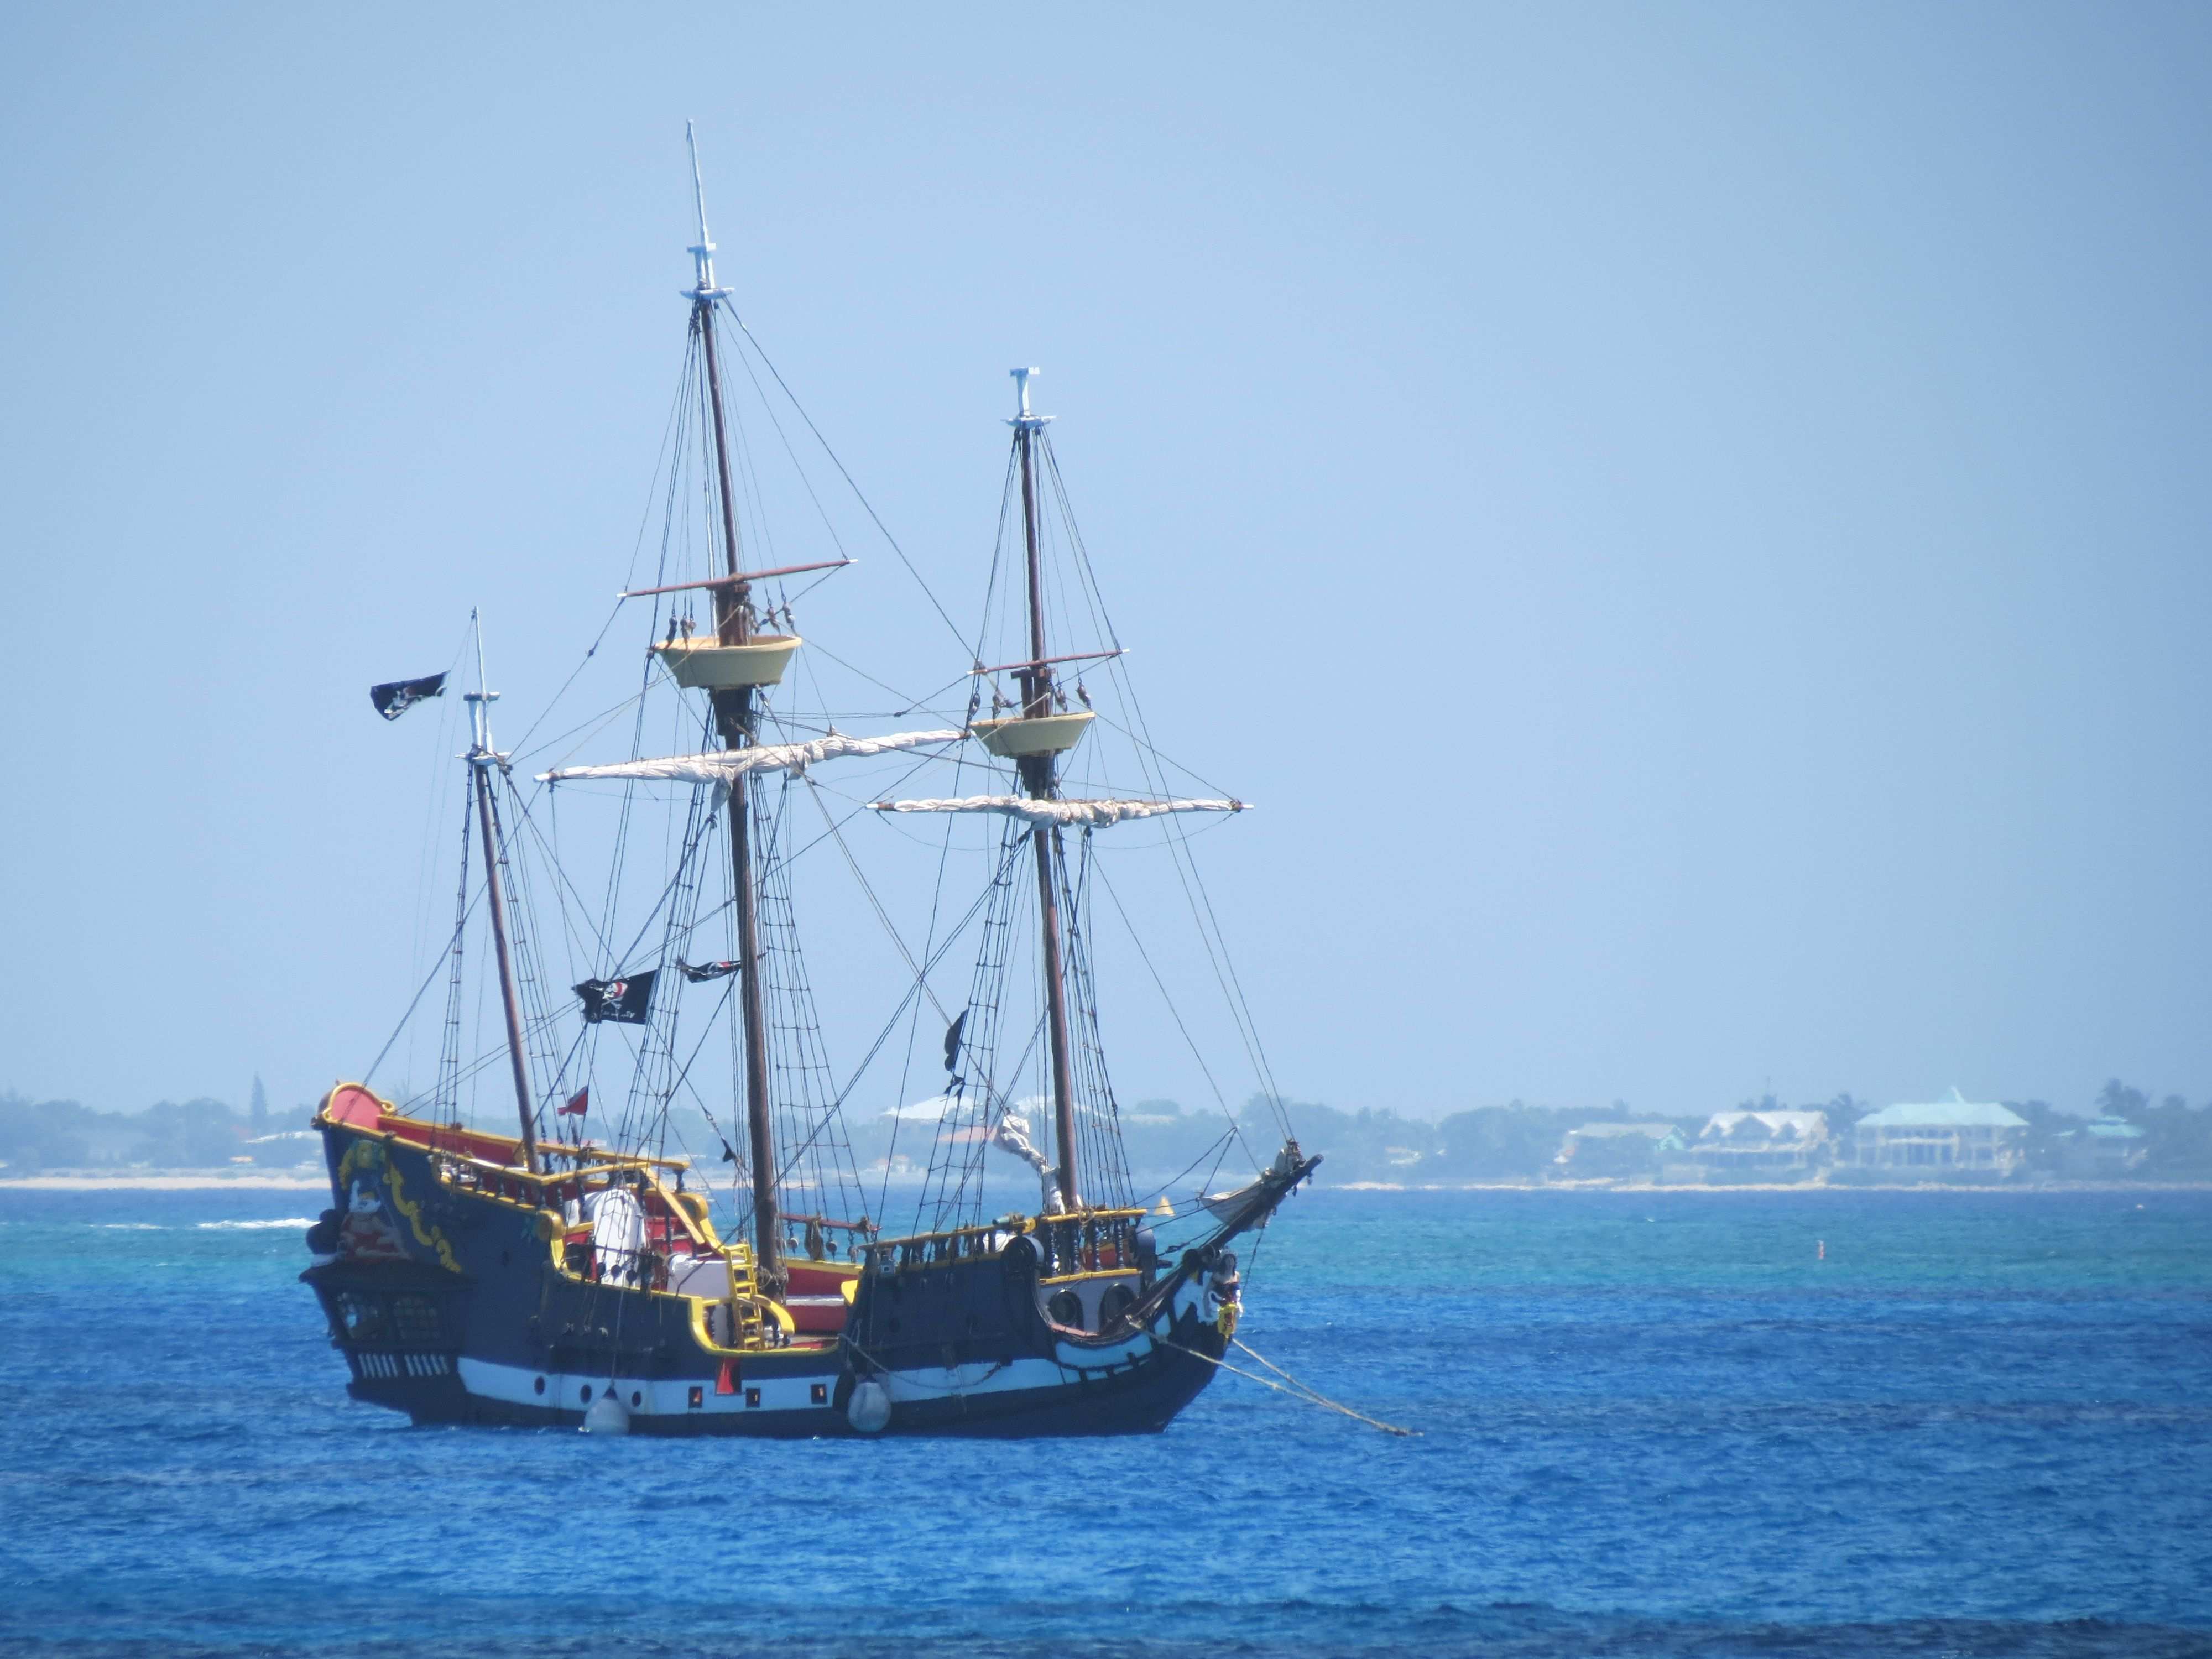 Pirate ship off Grand Caman Stuff I just like